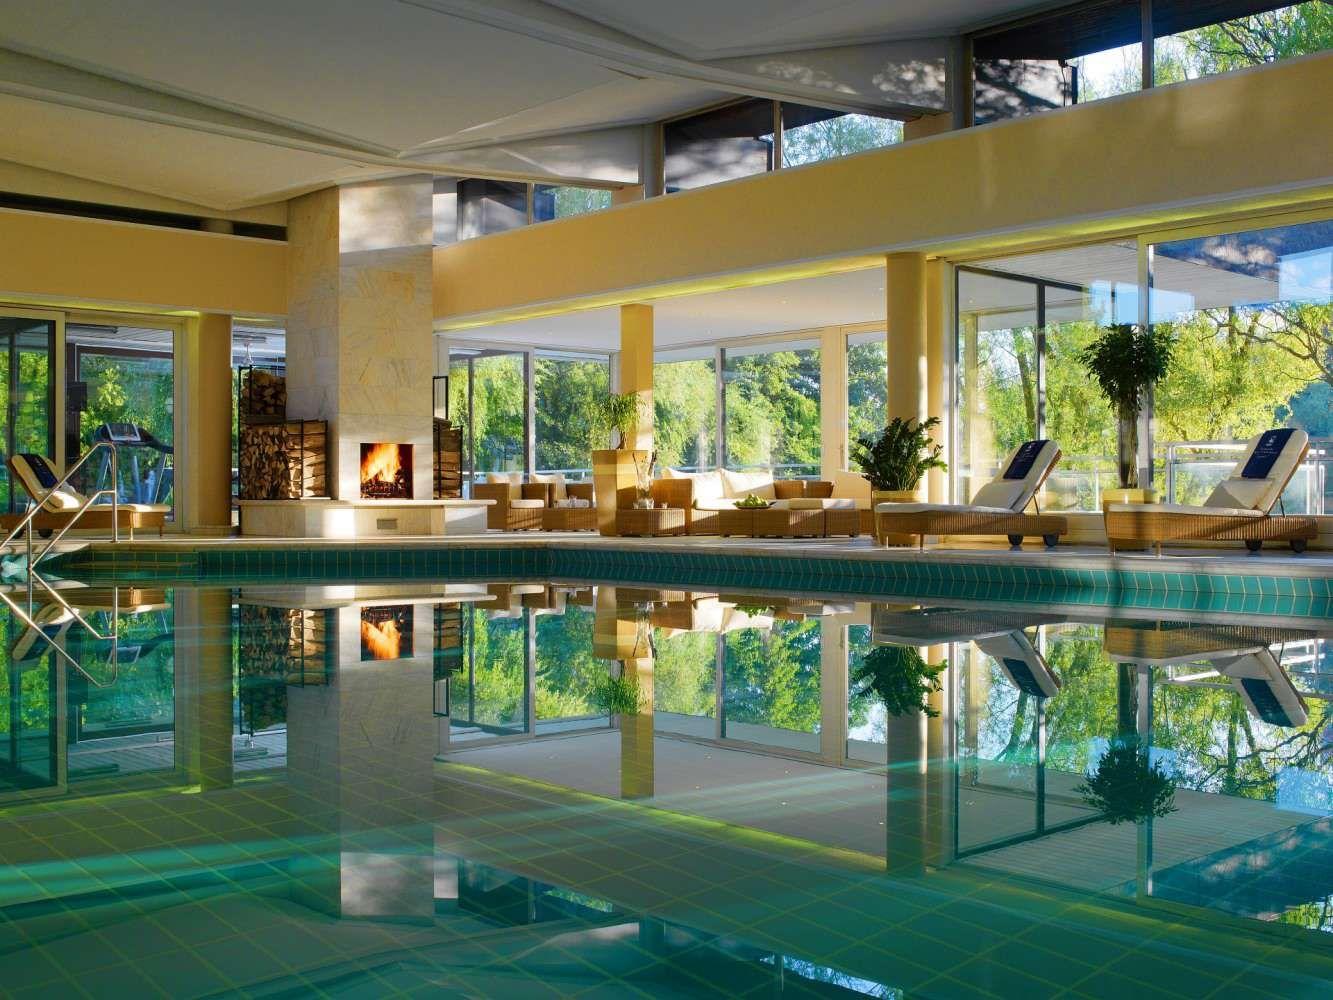 Kempinski Gravenbruch Spa Mit Eigenem See Pool Haus Hotels Hotel